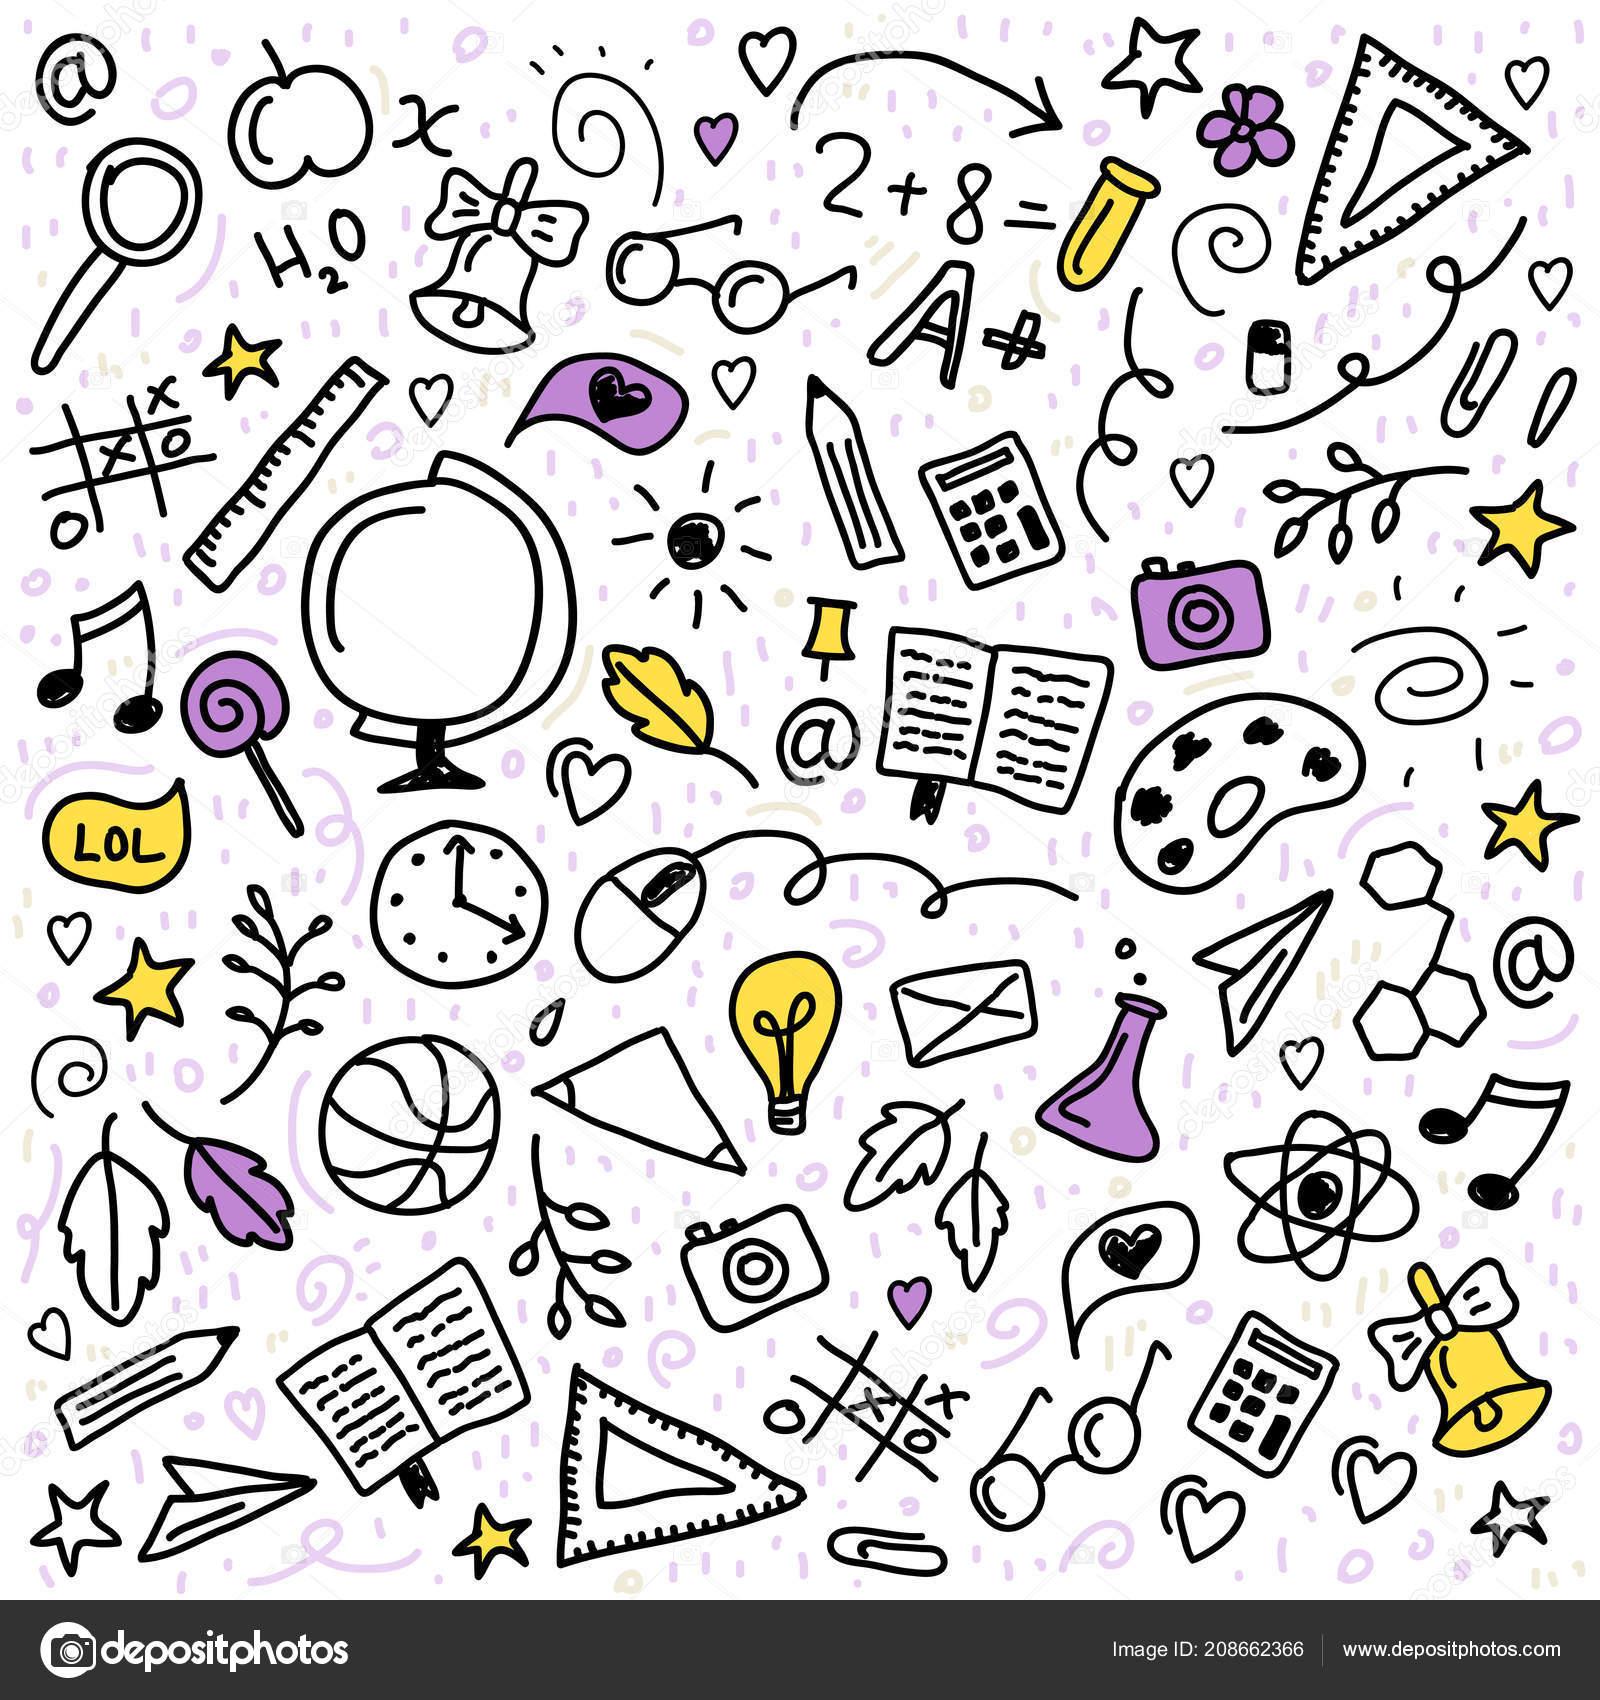 Cute Seamless Pattern School Supplies Creative Elements Back School Background Stock Vector C Igdeevaalena 208662366